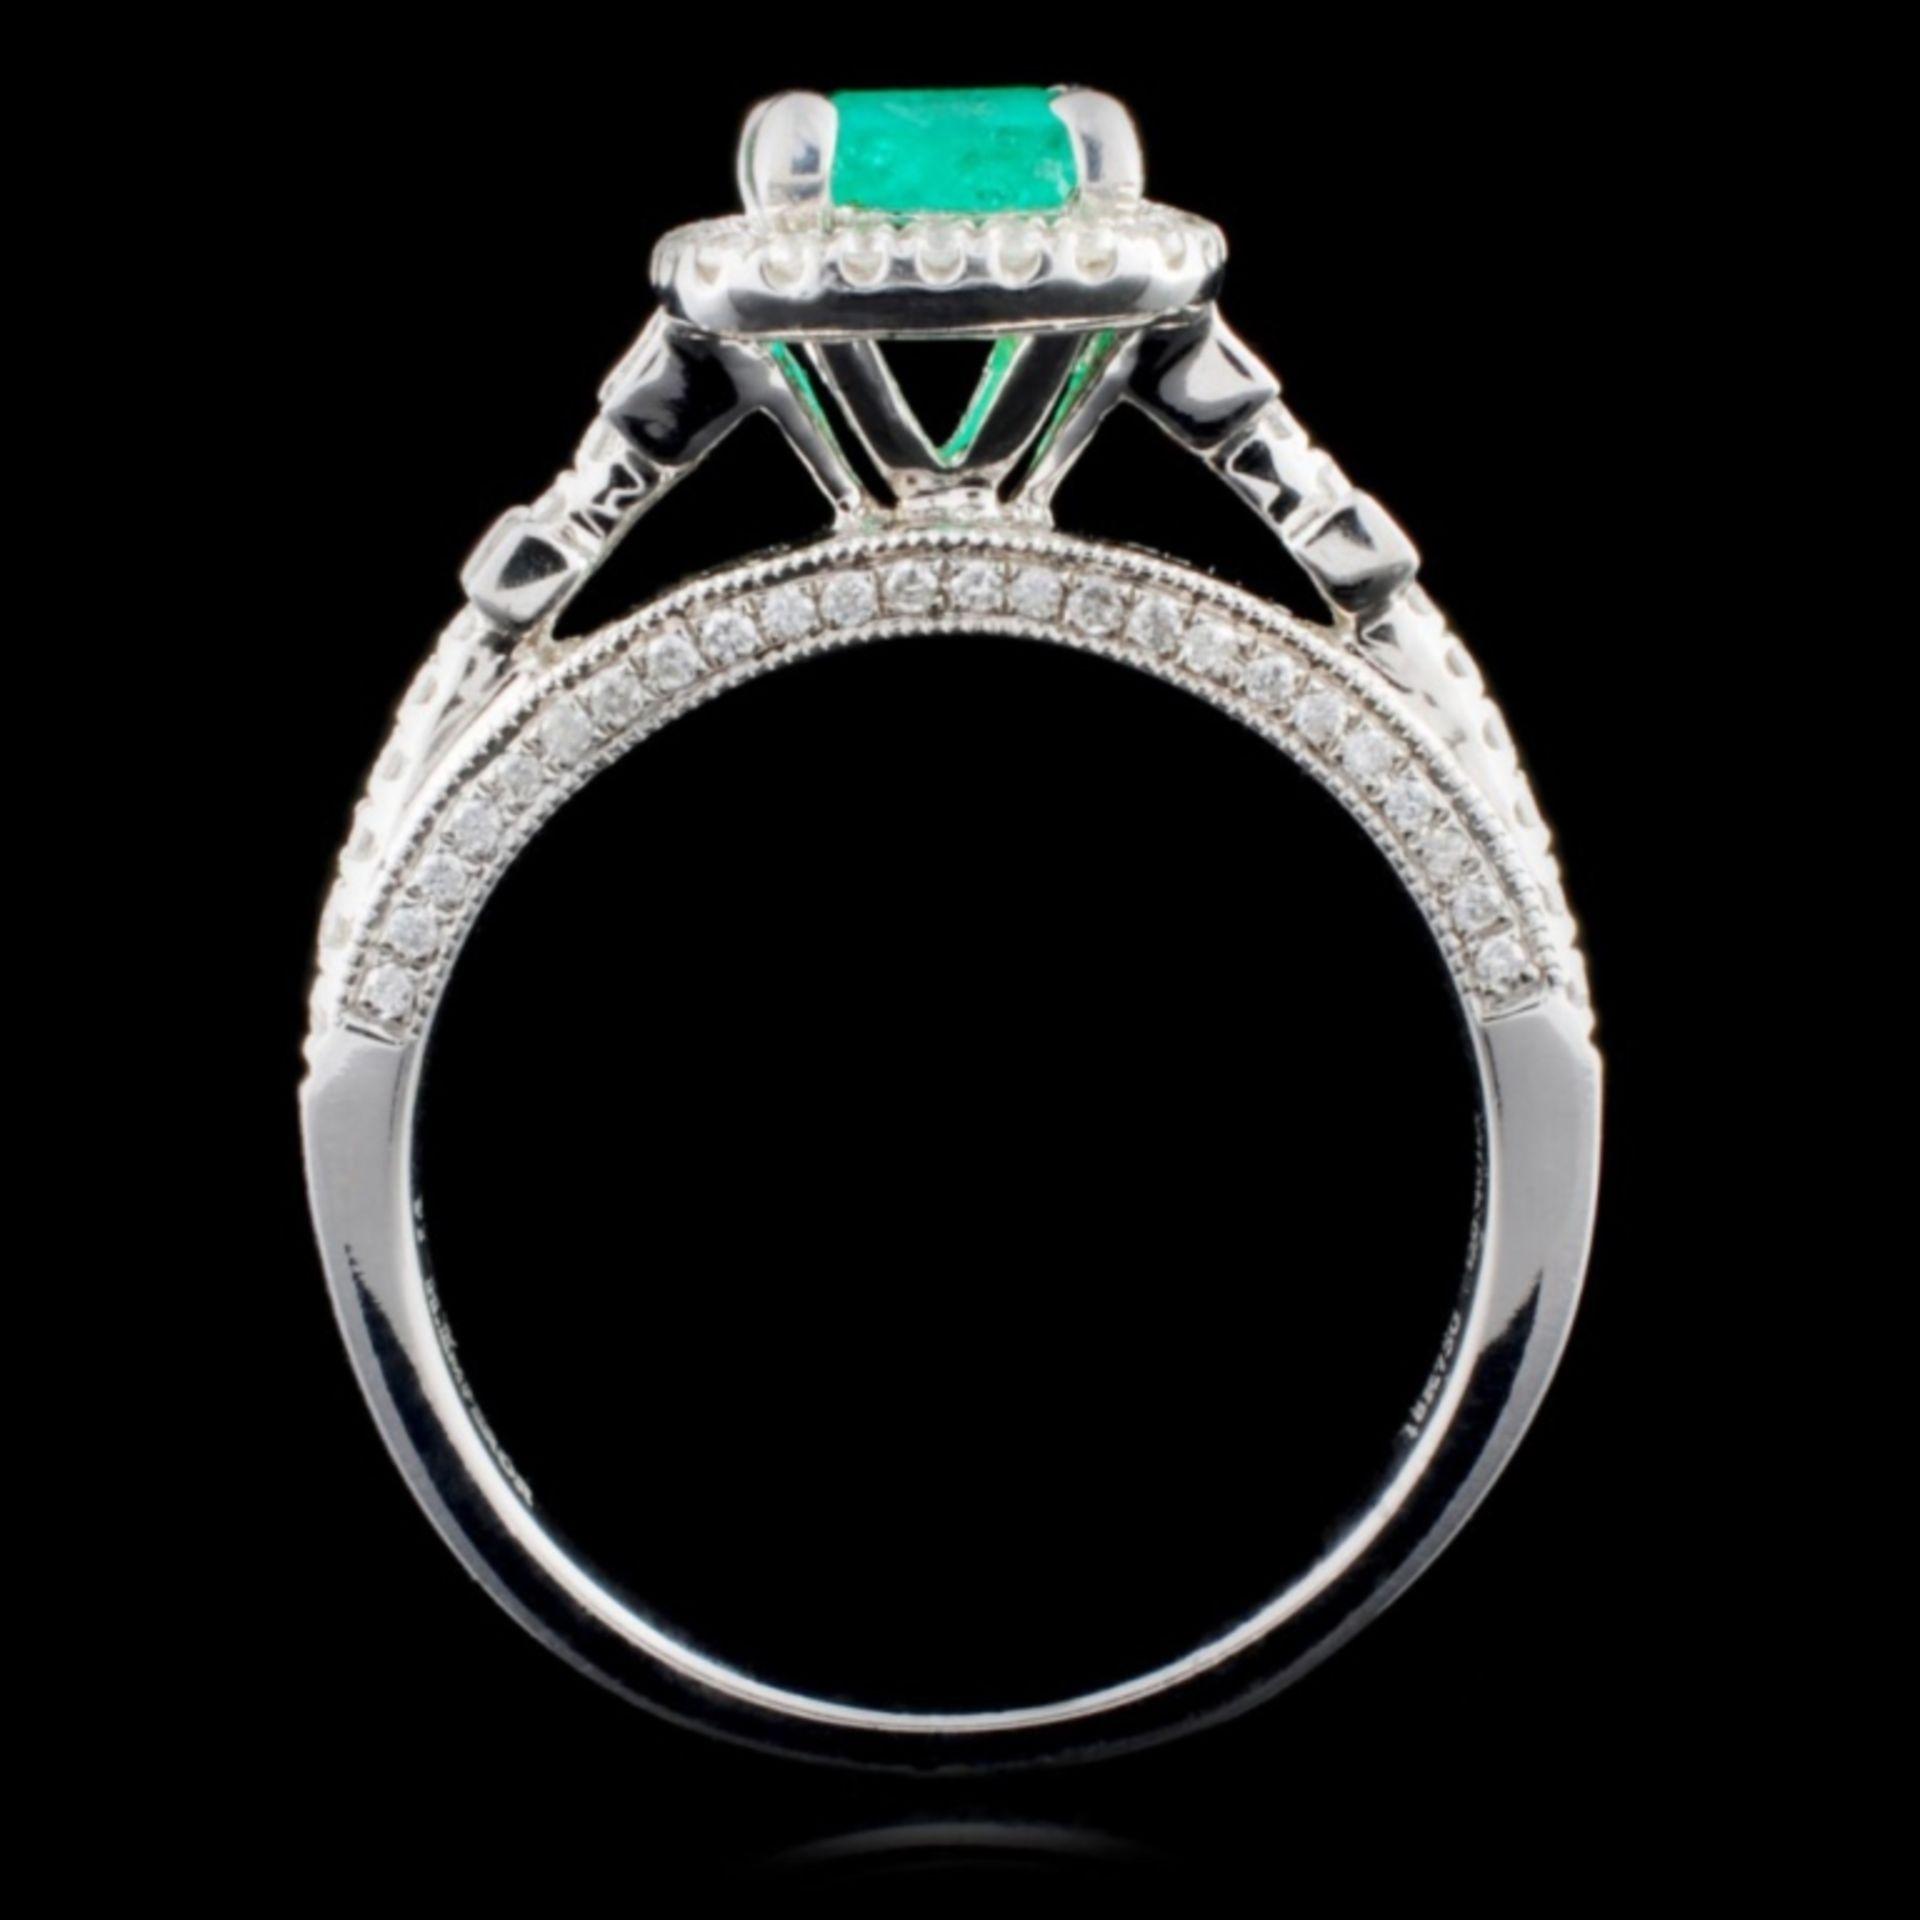 18K White Gold 0.69ct Emerald & 0.41ct Diamond Rin - Image 3 of 4